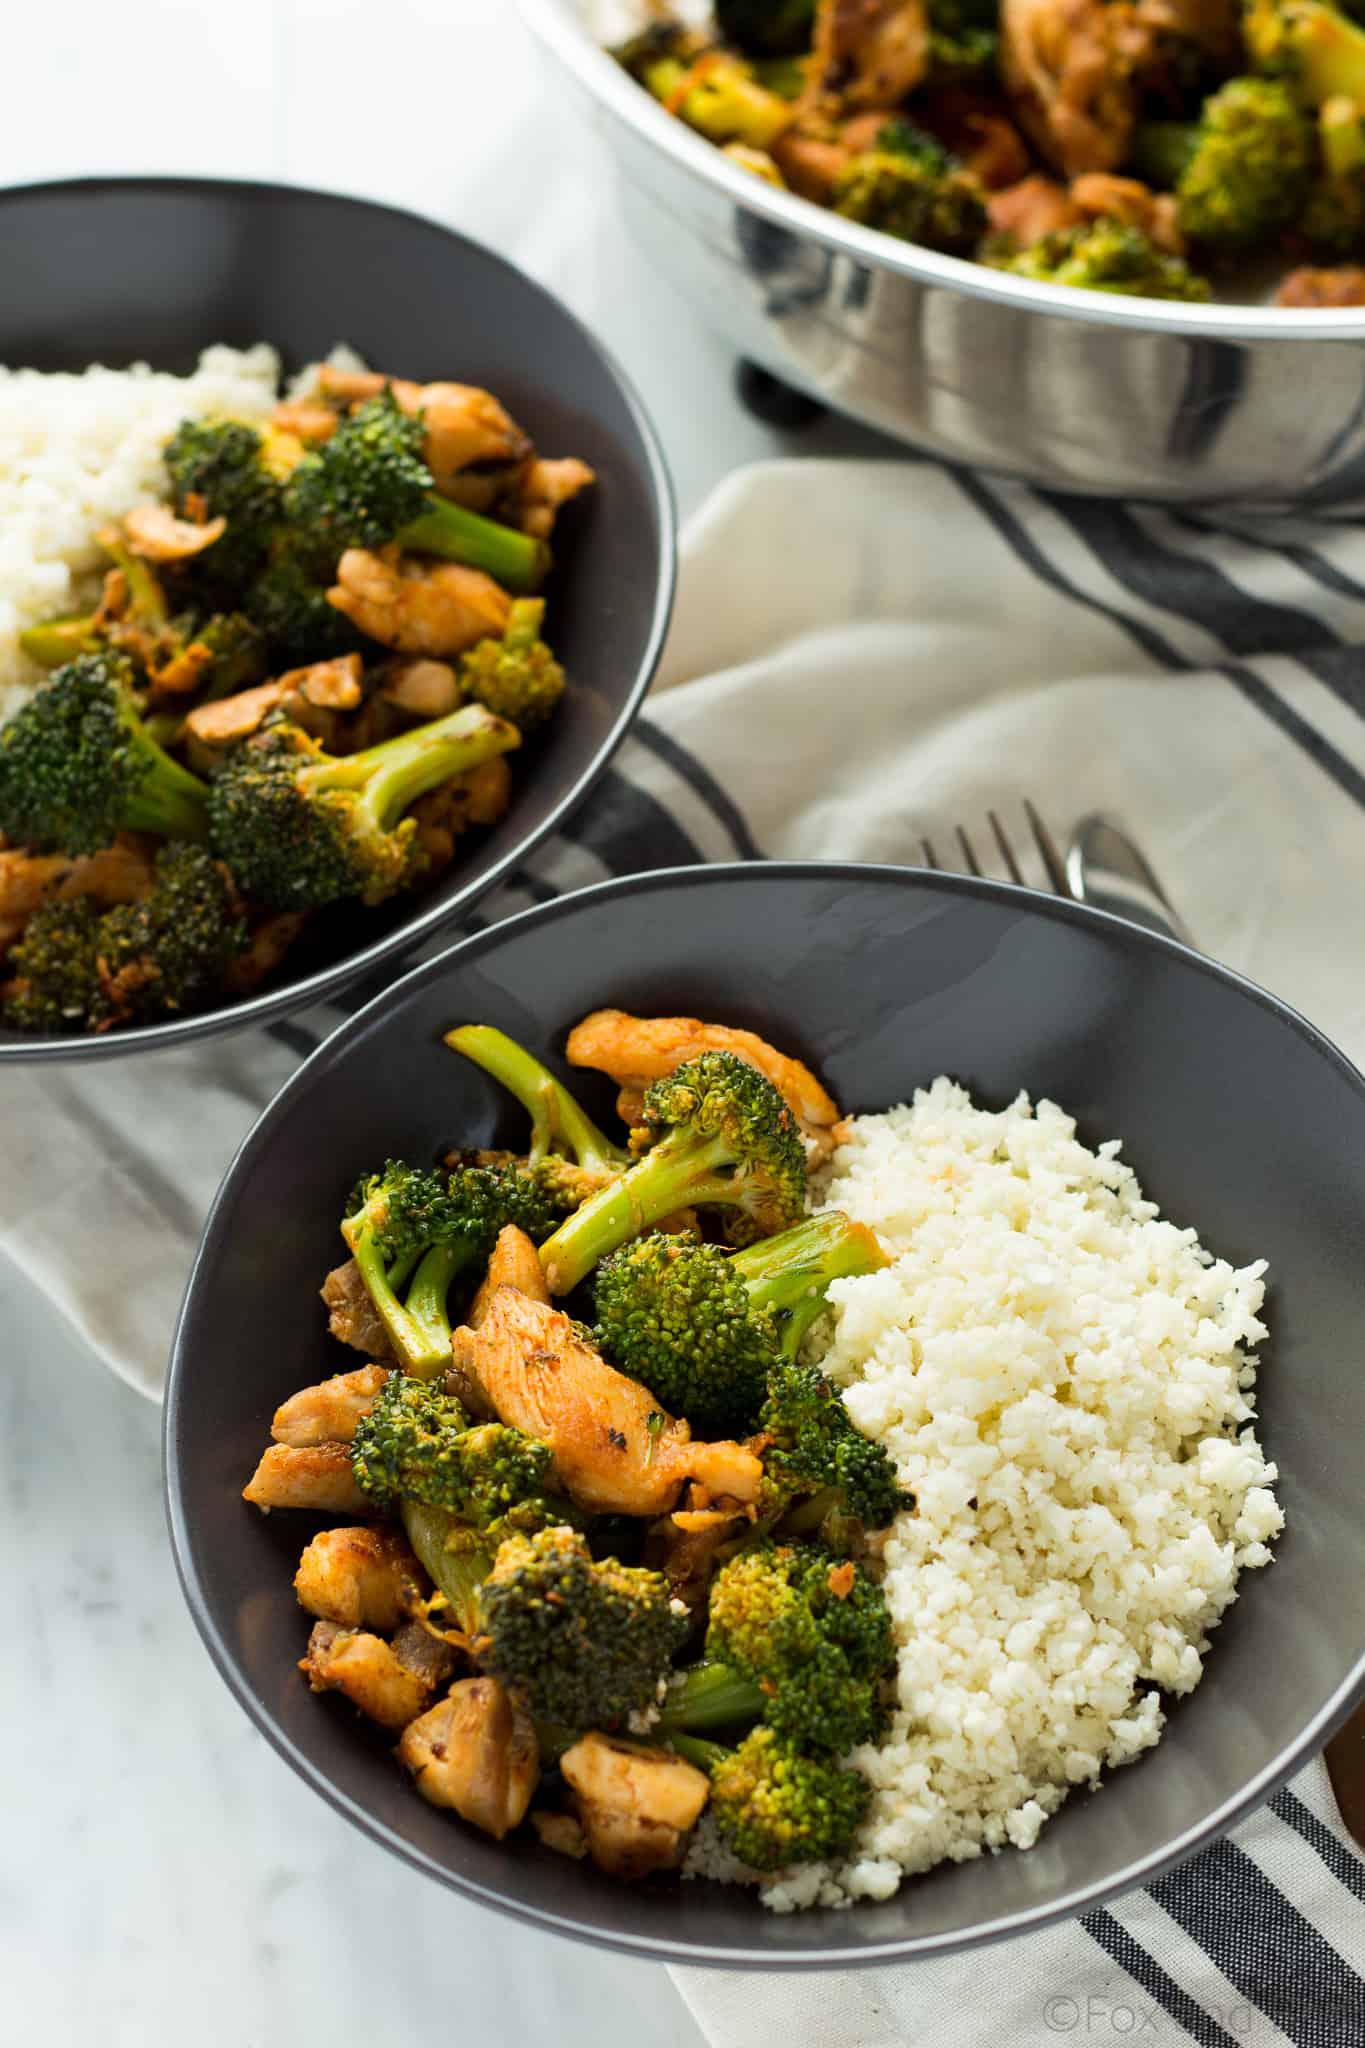 Buffalo chicken broccoli bowl